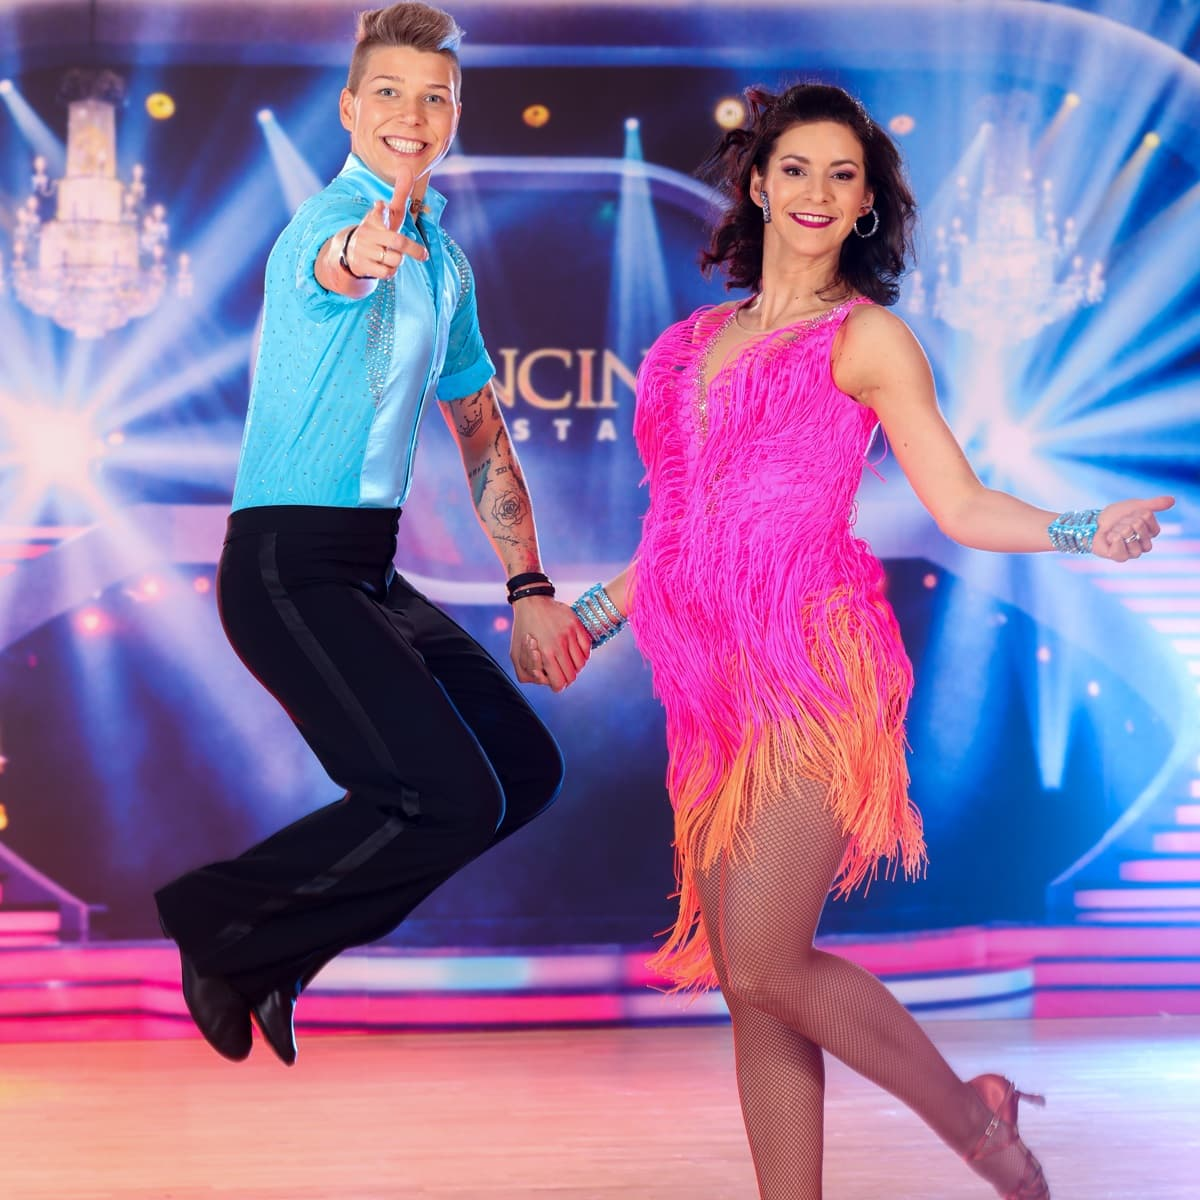 Virginia Ernst - Alexandra Scheriau bei den Dancing Stars 2019 am 22.3.2019